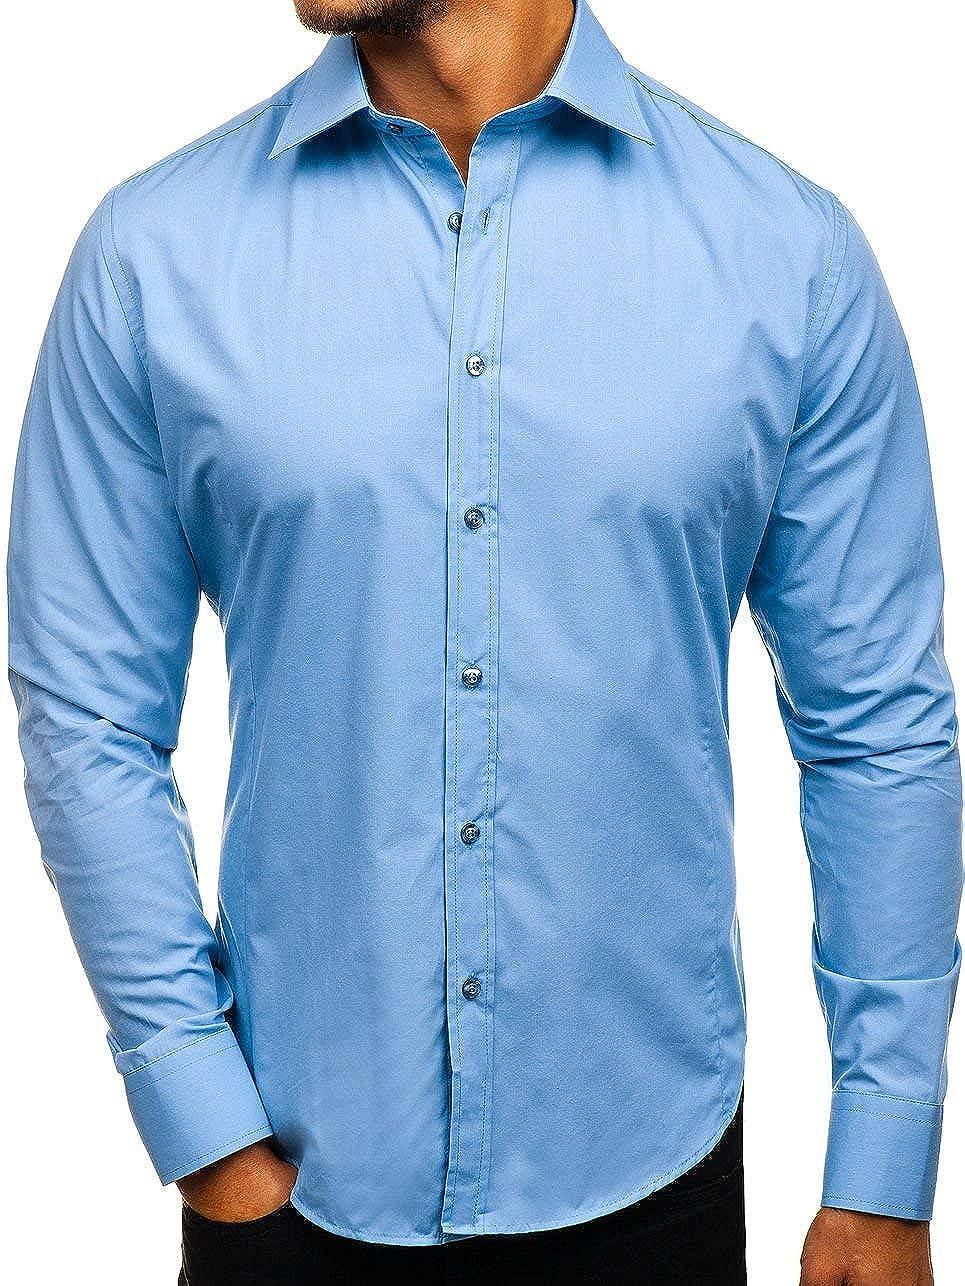 BOLF Herren Hemd Langarm Basic Slim Fit Elegant Business Style 2B2 BOLF 1721 216539060a